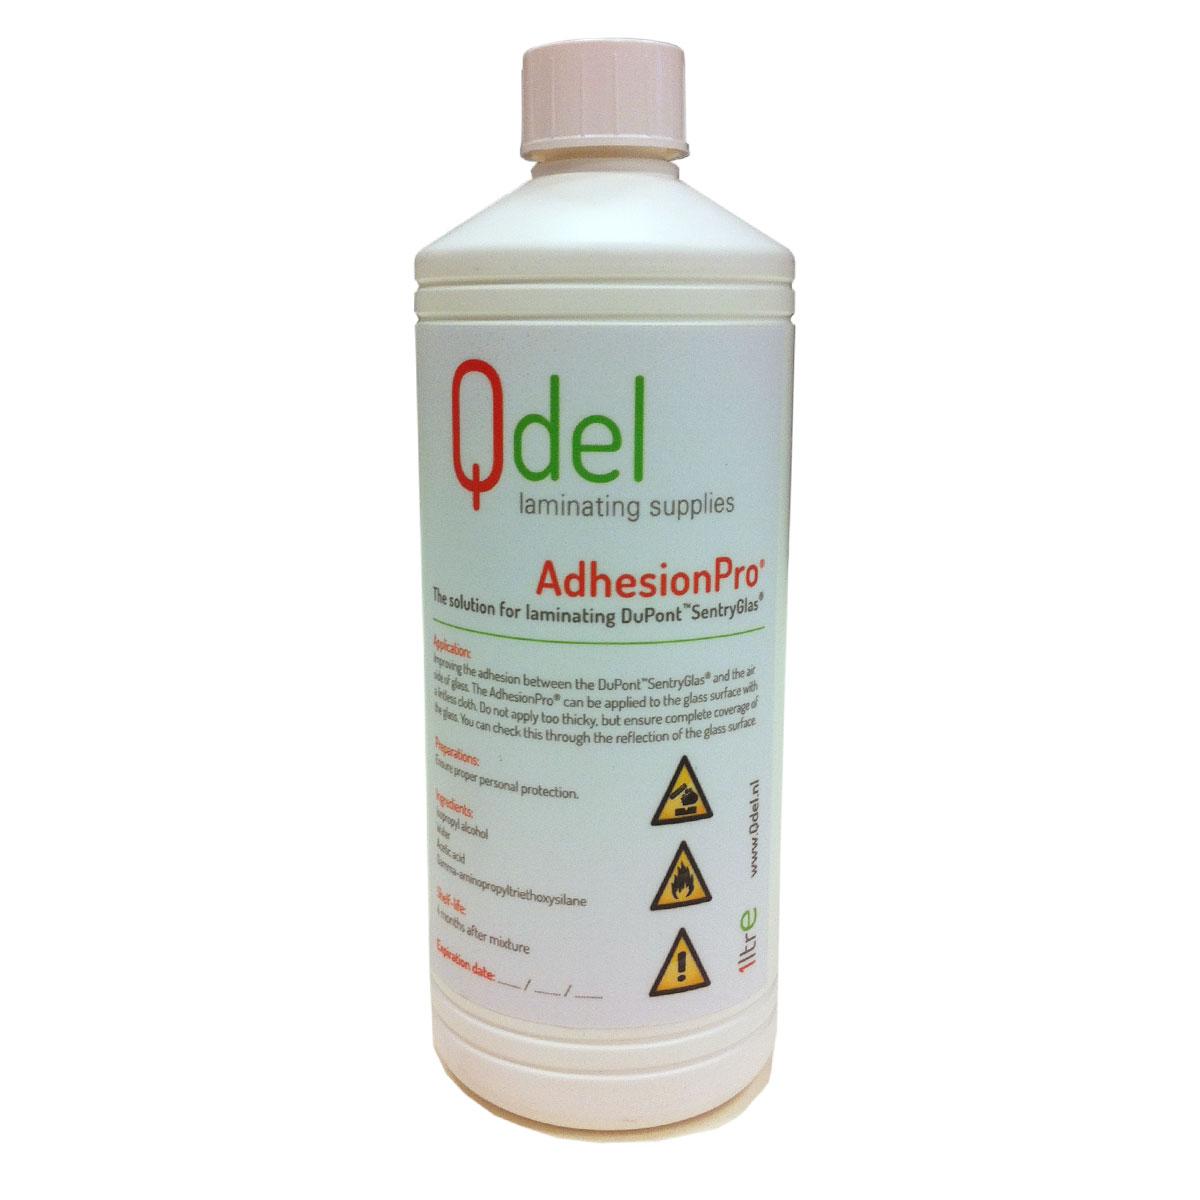 adhesionpro 1 liter